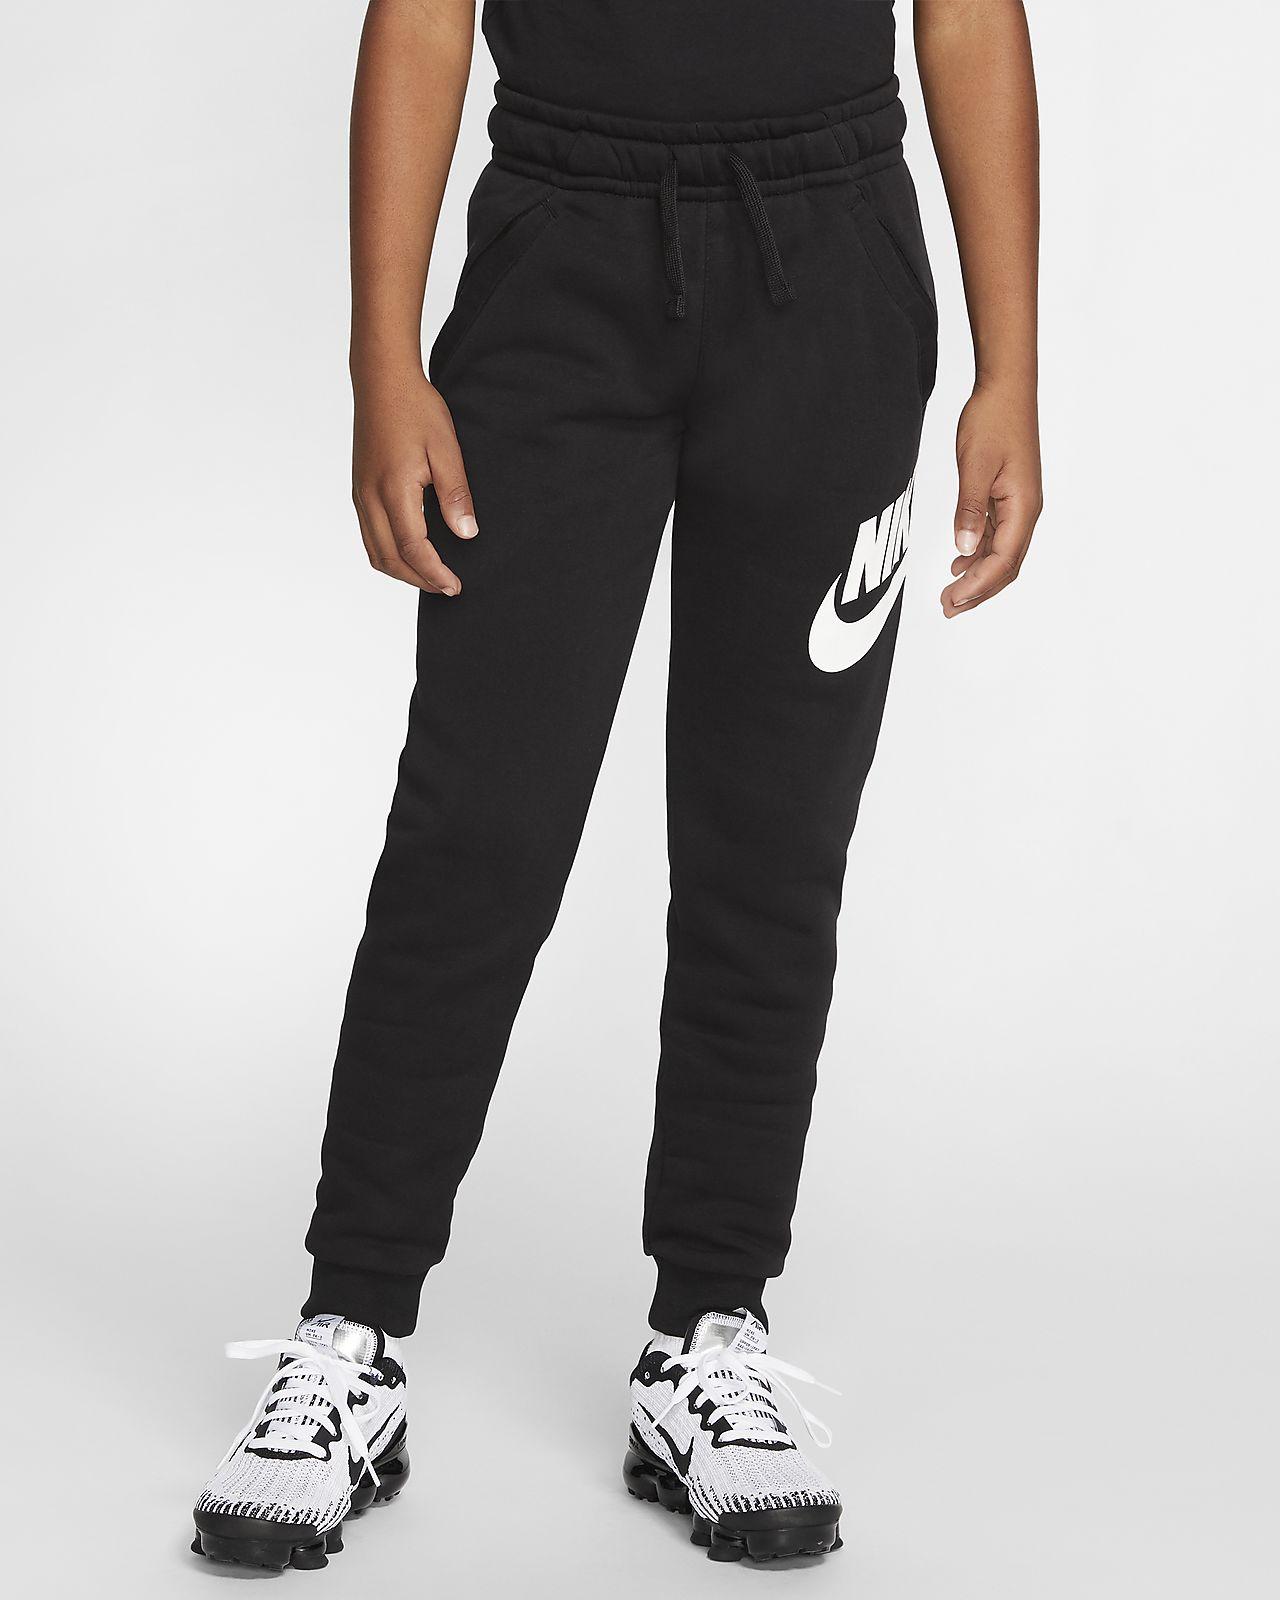 Pantalon Nike Sportswear Club Fleece NoirNoirBlanc